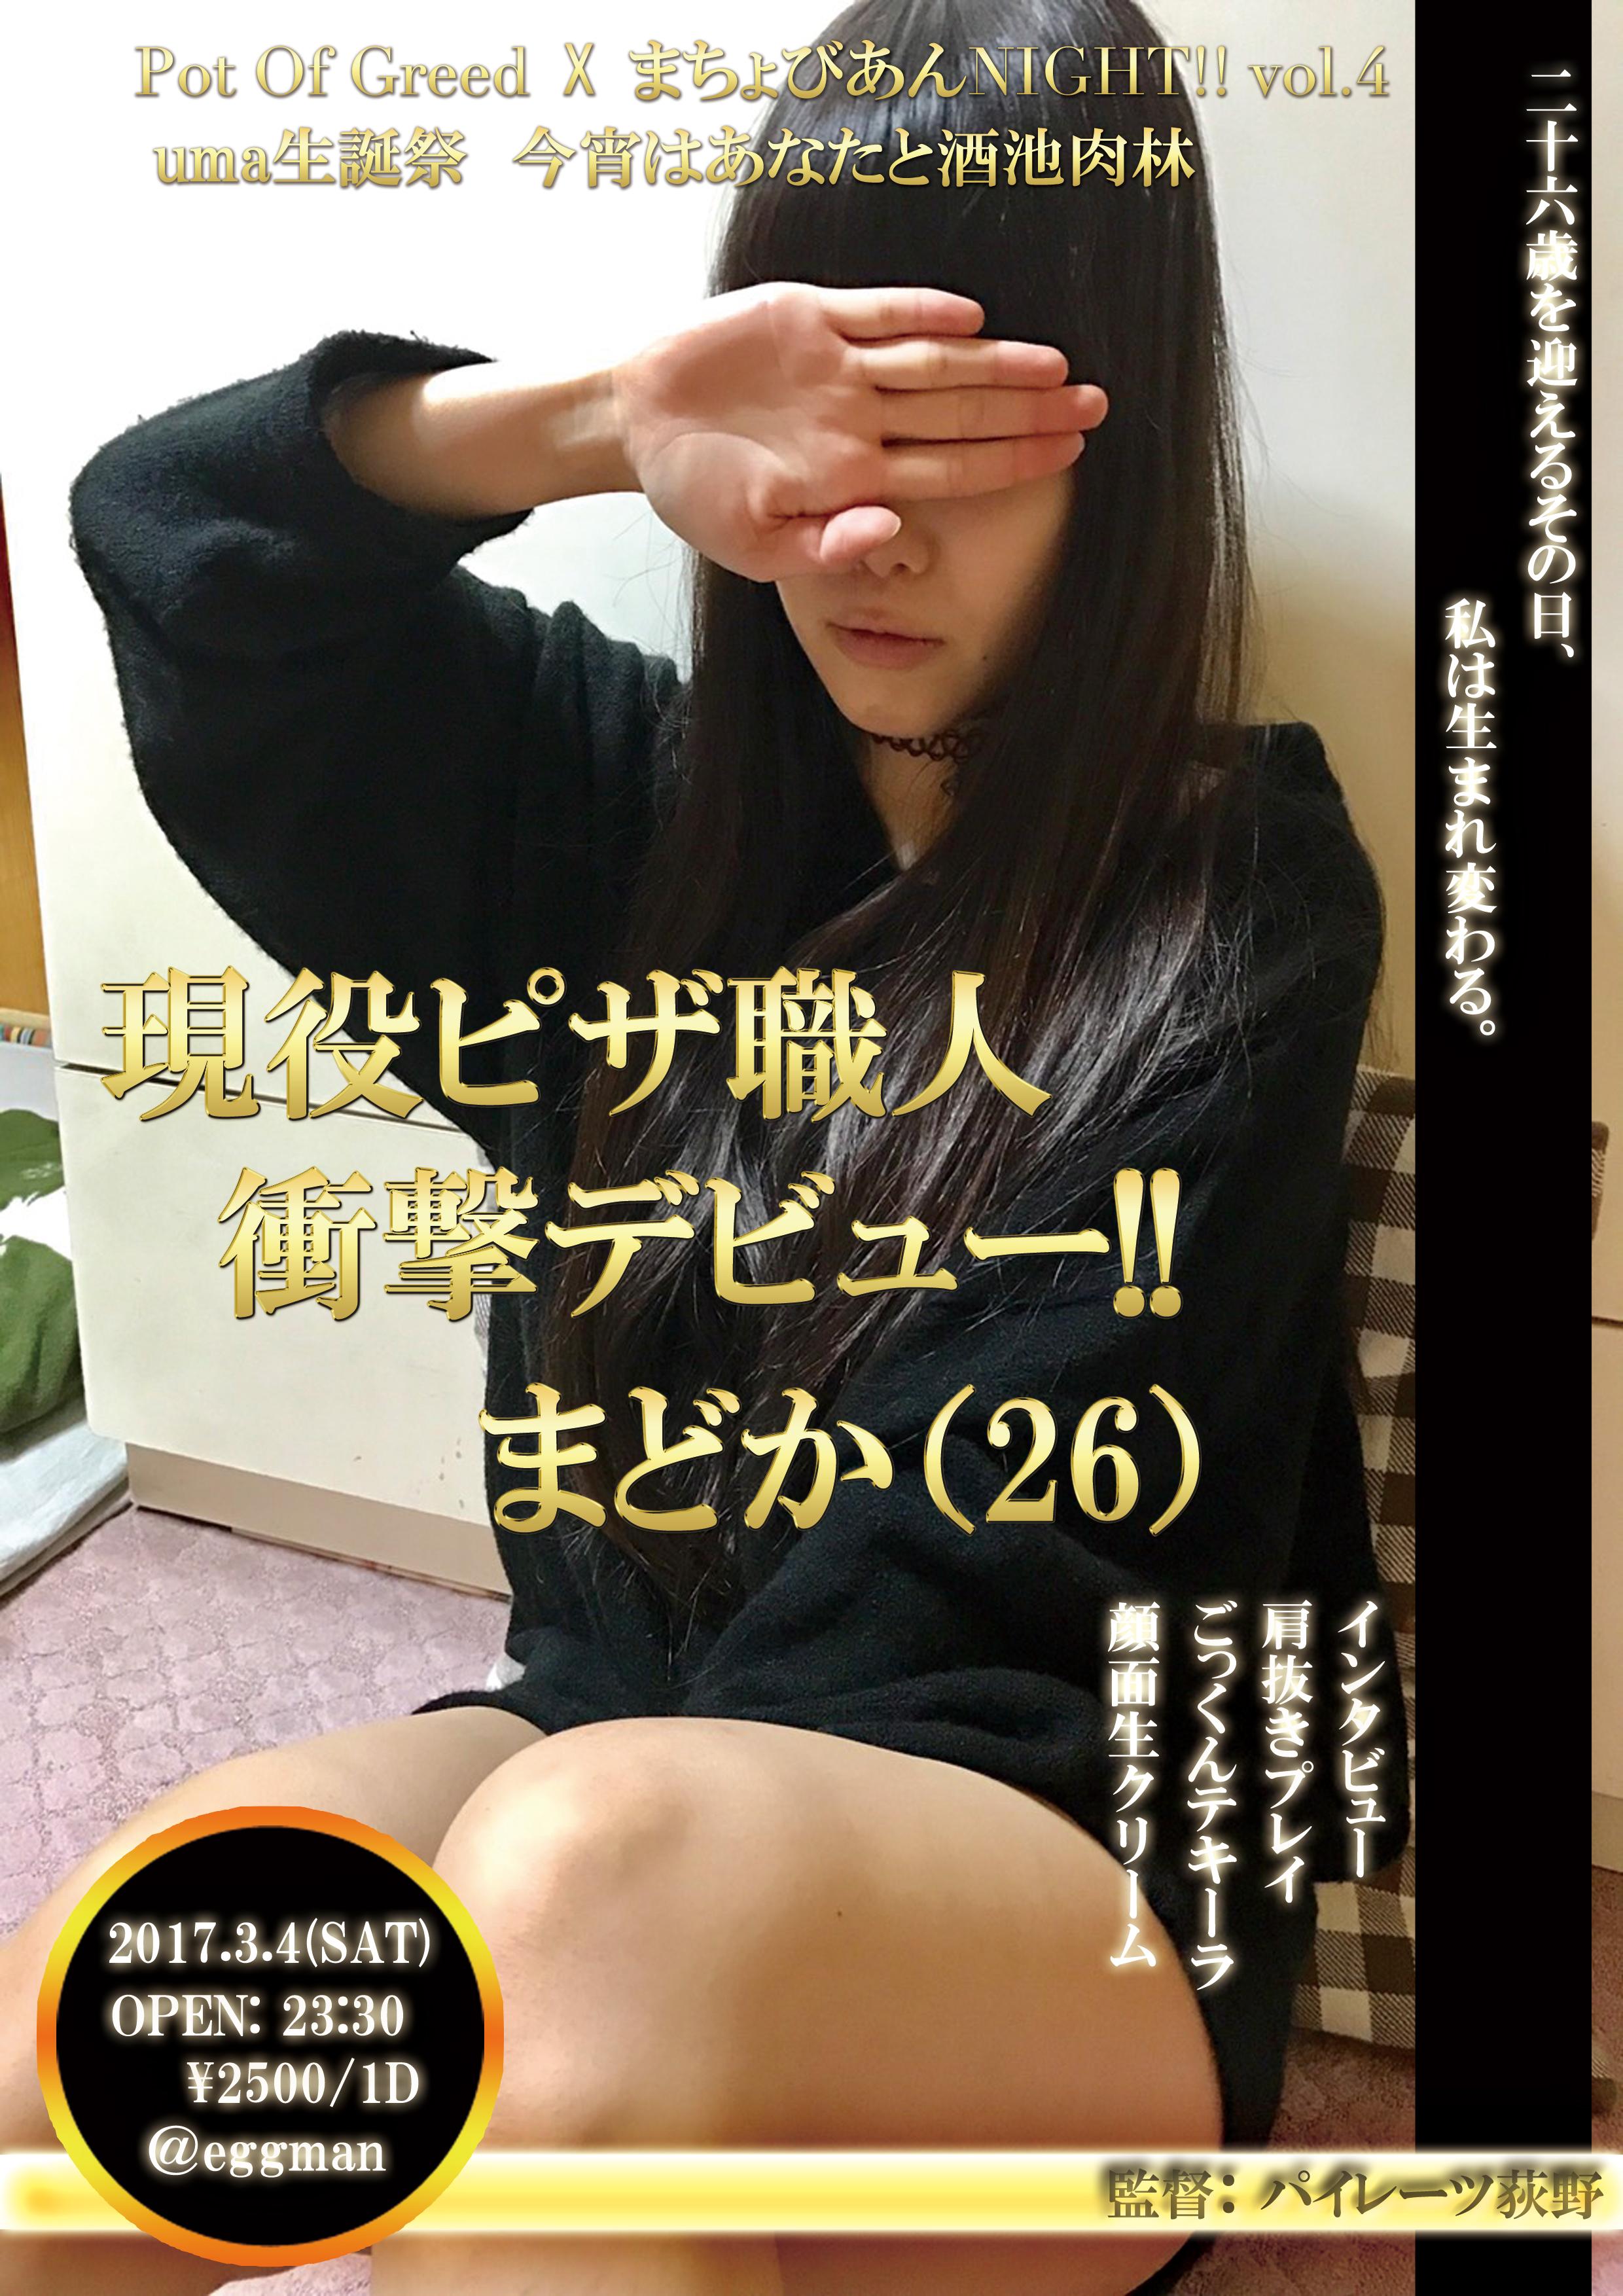 PotOfGreed×まちょびあんNight!! vol.4<br>☆uma生誕祭☆ 〜今宵は貴方と酒池肉林〜